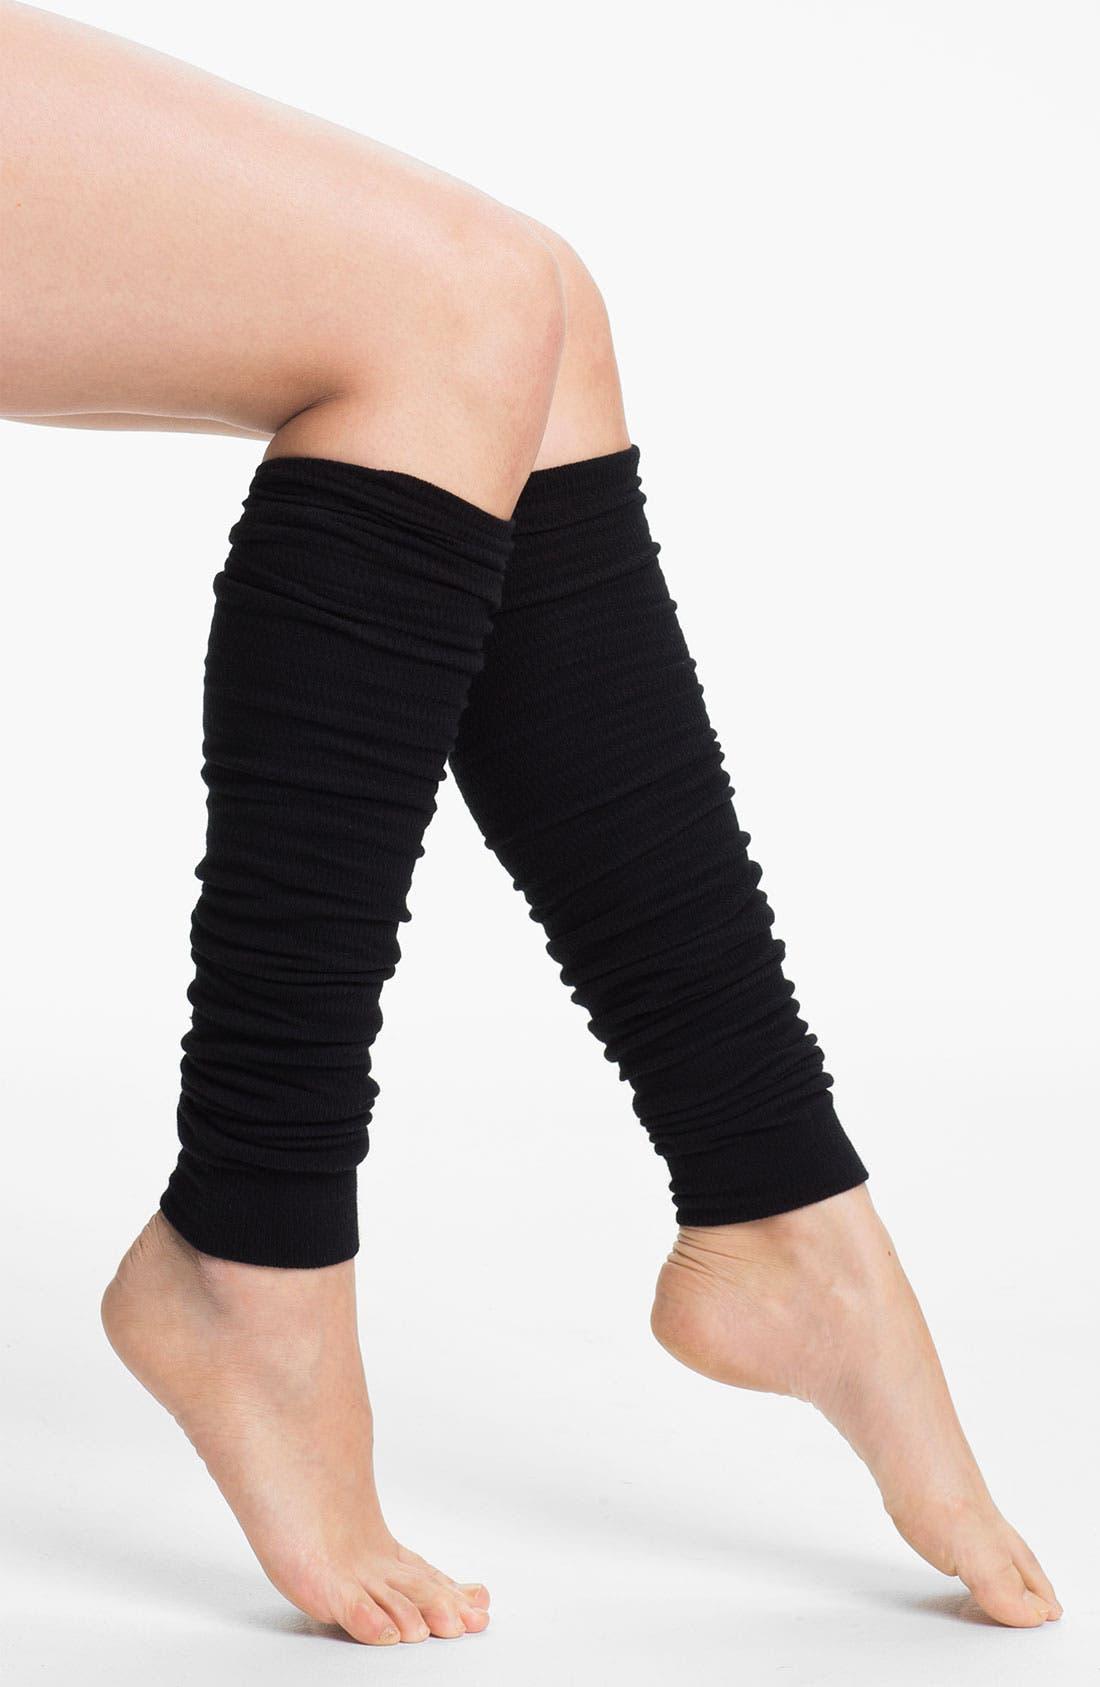 UNIT-Y 'Fancy Feet' Leg Warmers, Main, color, 001